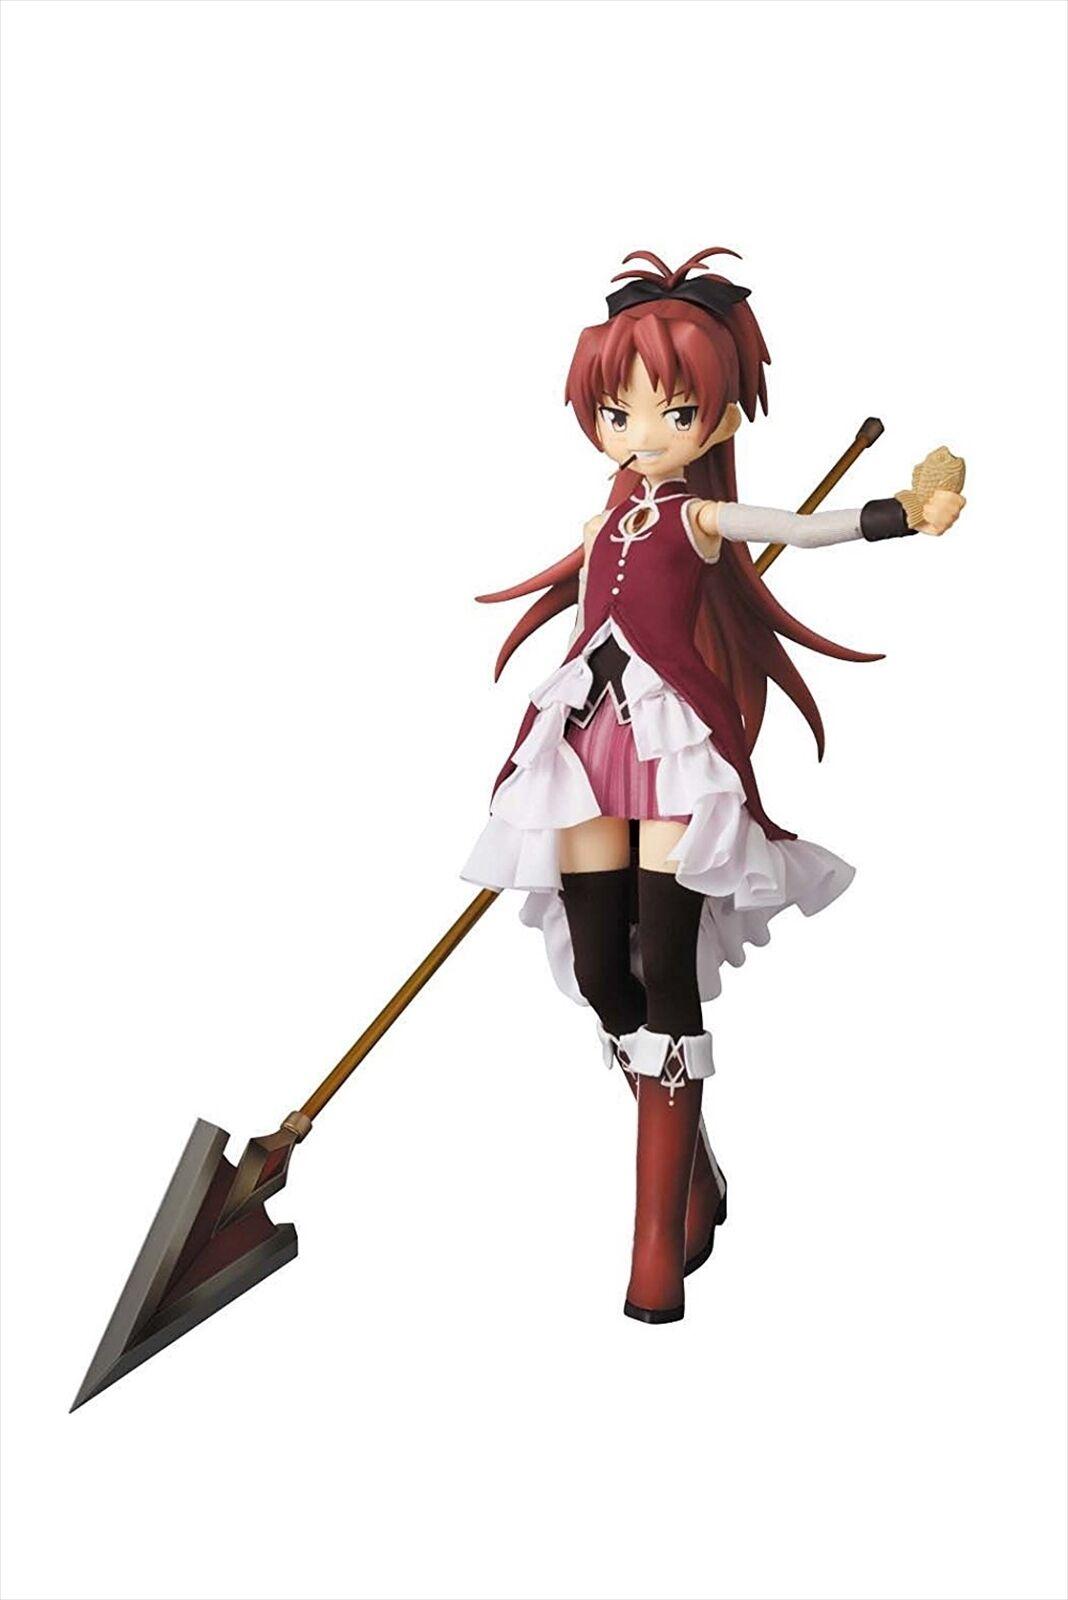 Medicom RAH Puella Magi Madoka Magica Kyoko Sakura Real Action Heroes Figure